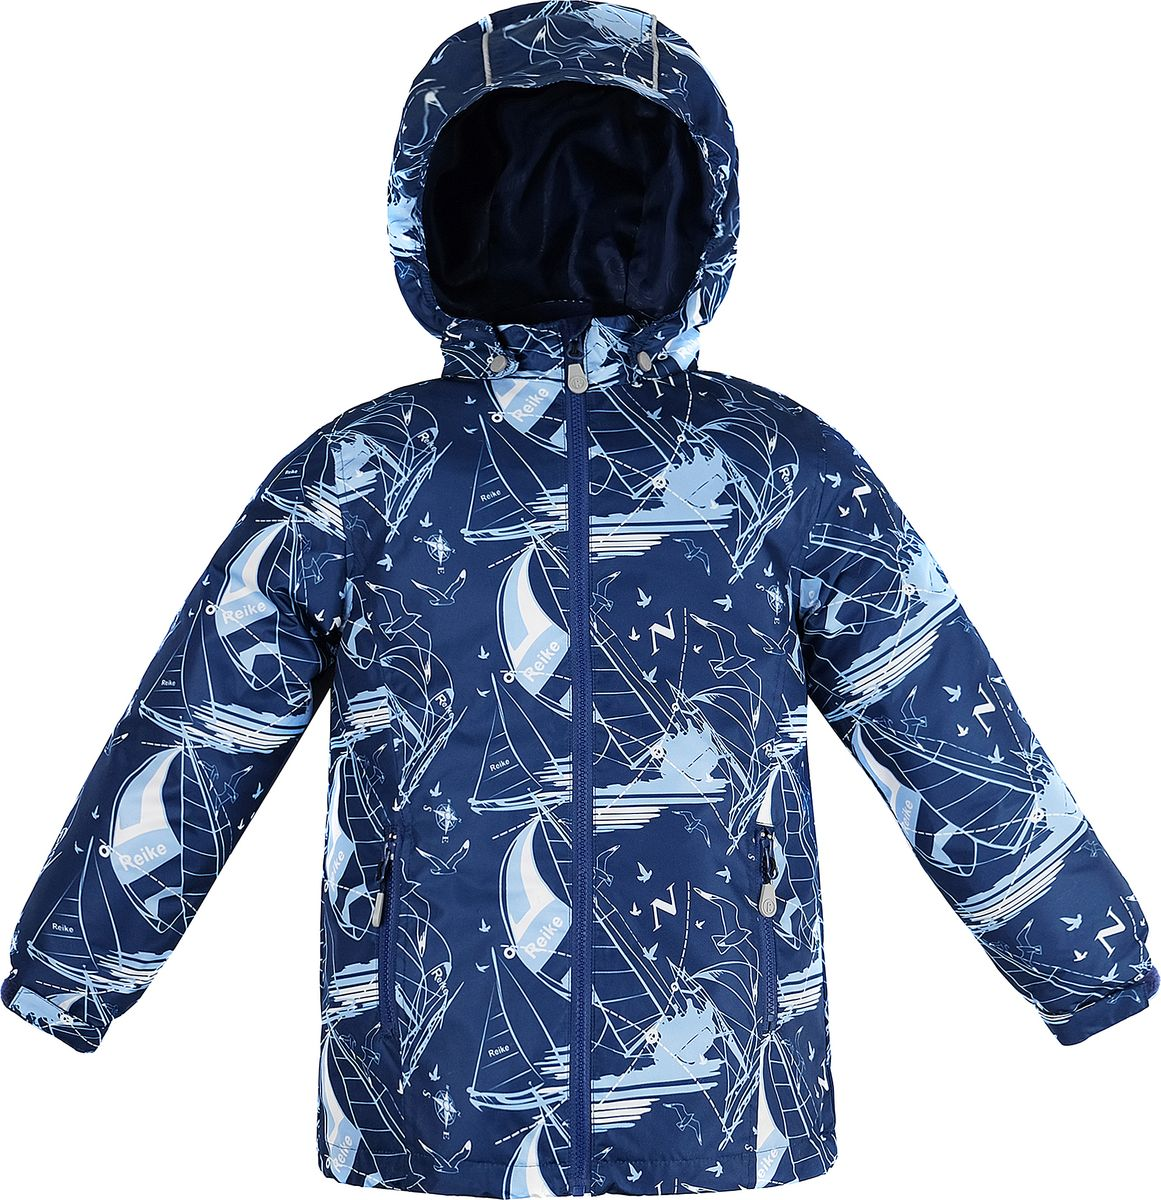 Куртка для мальчика Reike, цвет: темно-синий. 40 900 115_YAHT(FL) navy. Размер 158, 13 лет40 900 115_YAHT(FL) navy